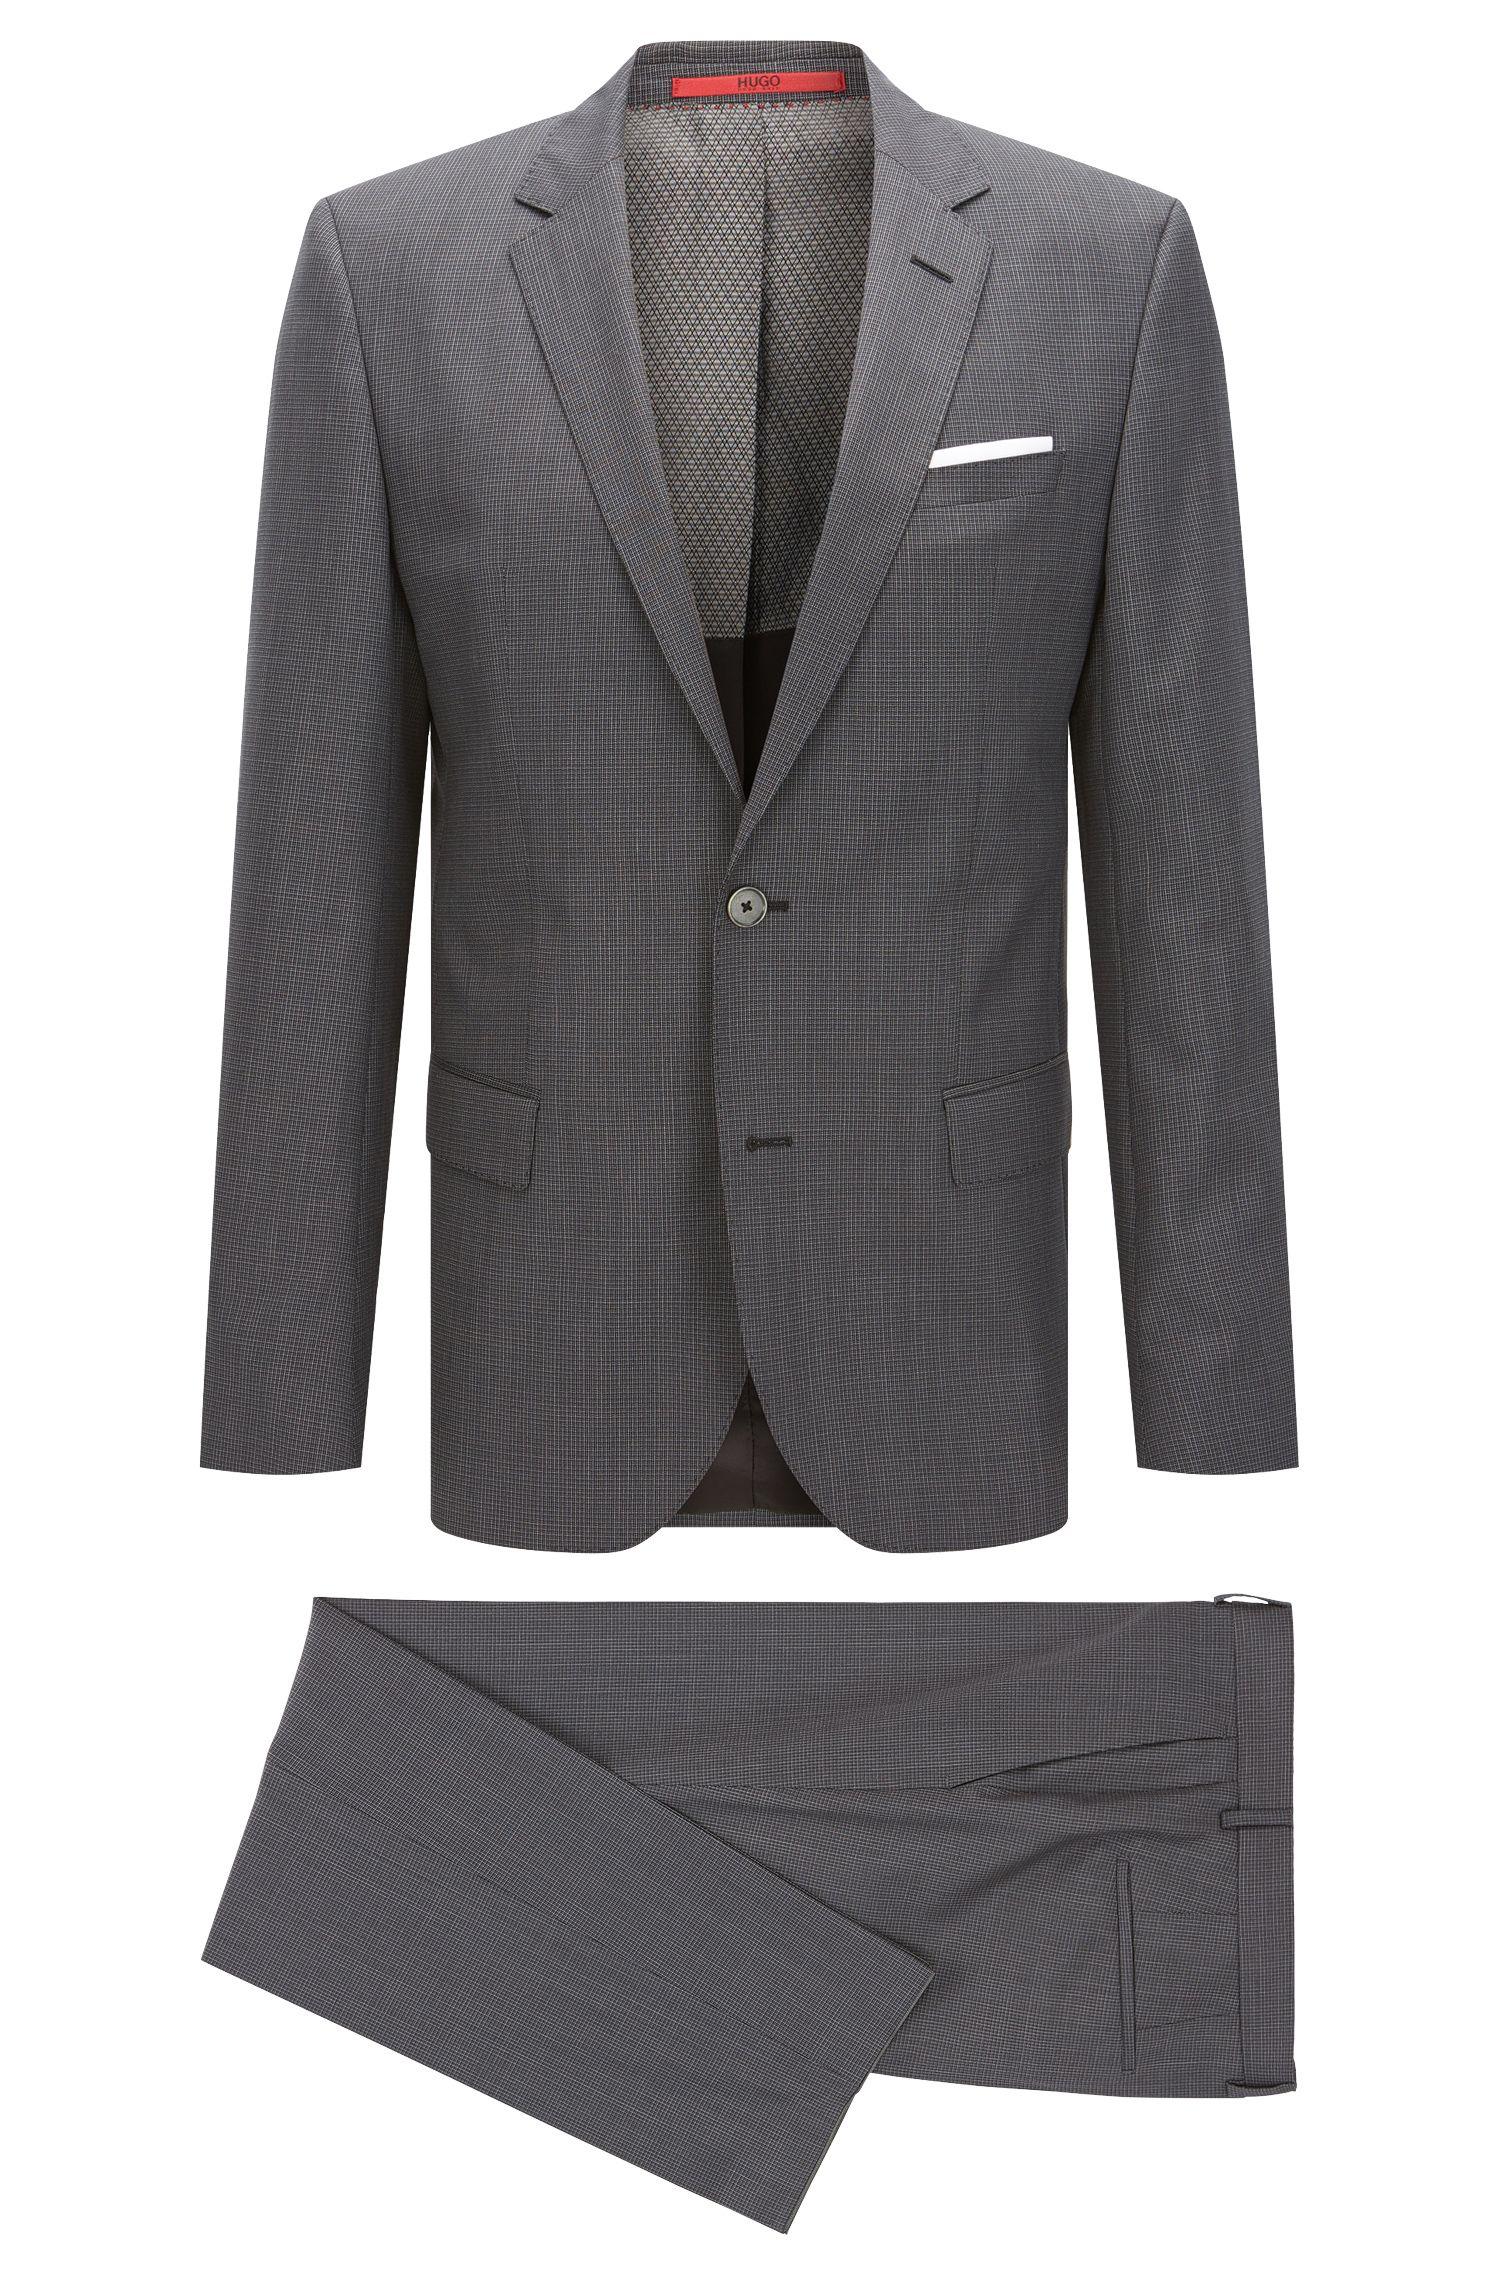 'Hutson/Gander' | Slim Fit, Textured Check Virgin Wool Blend Suit